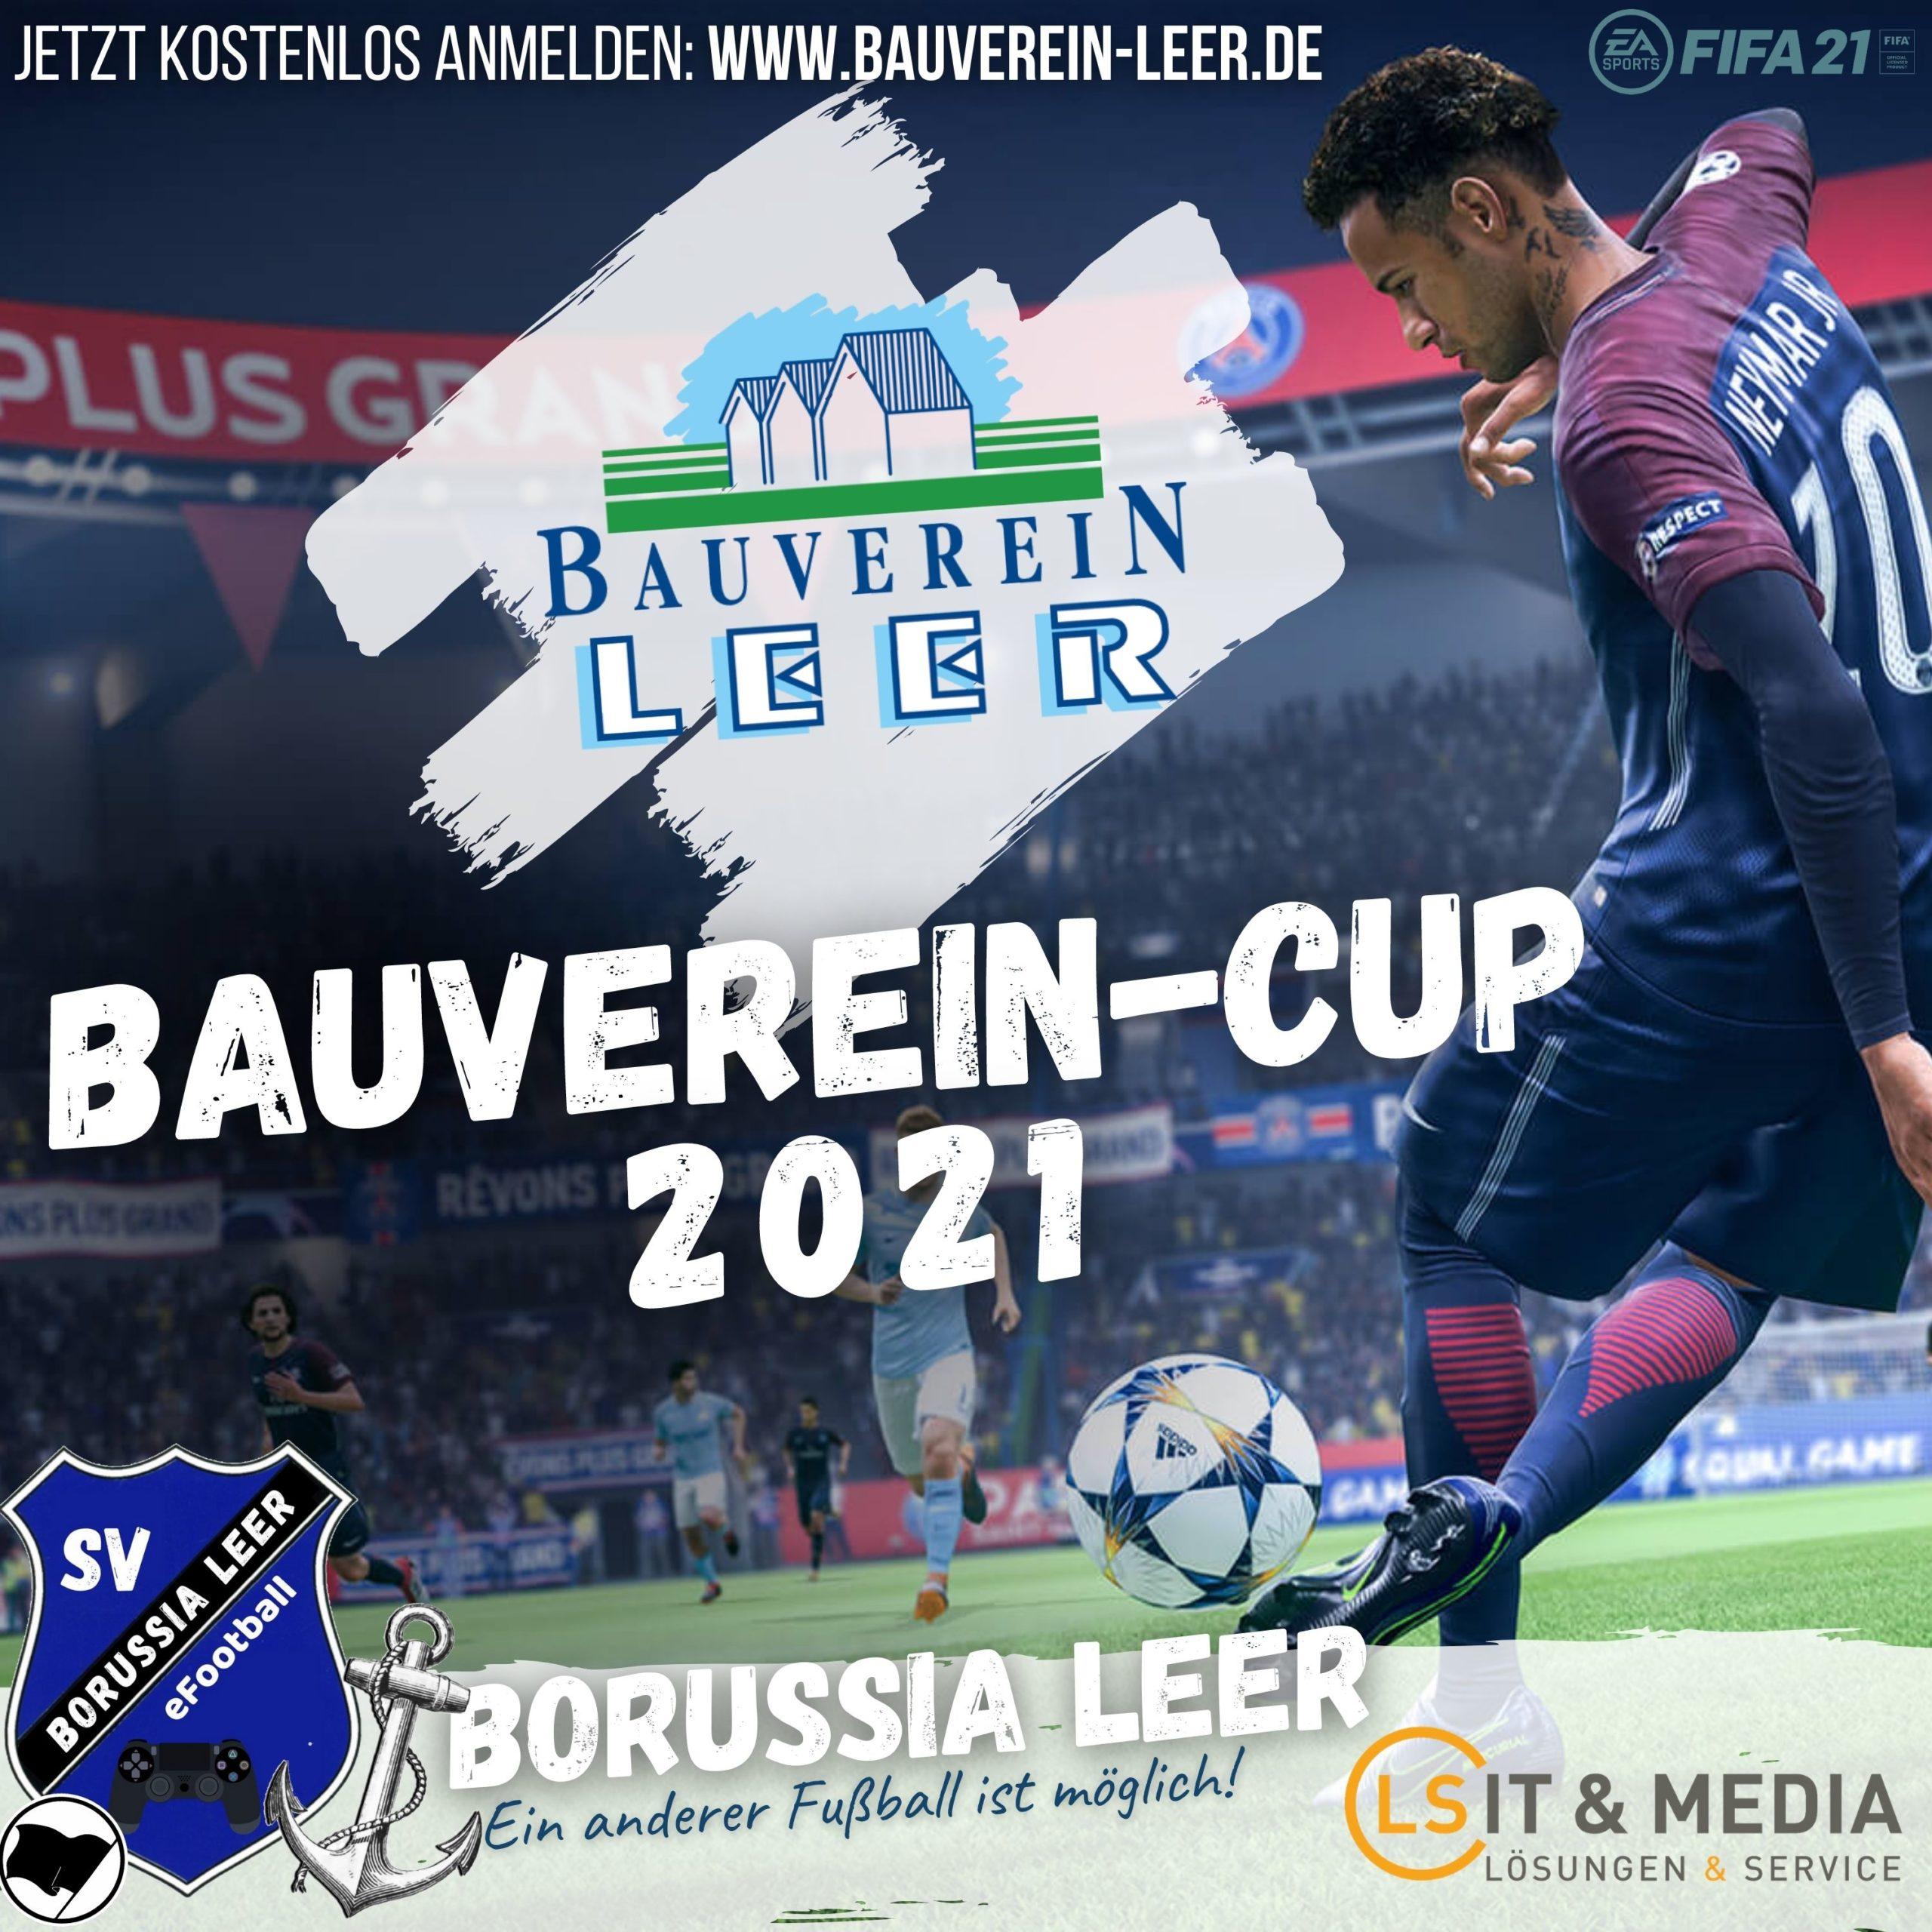 Bauverein-Cup des SV Borussia Leer